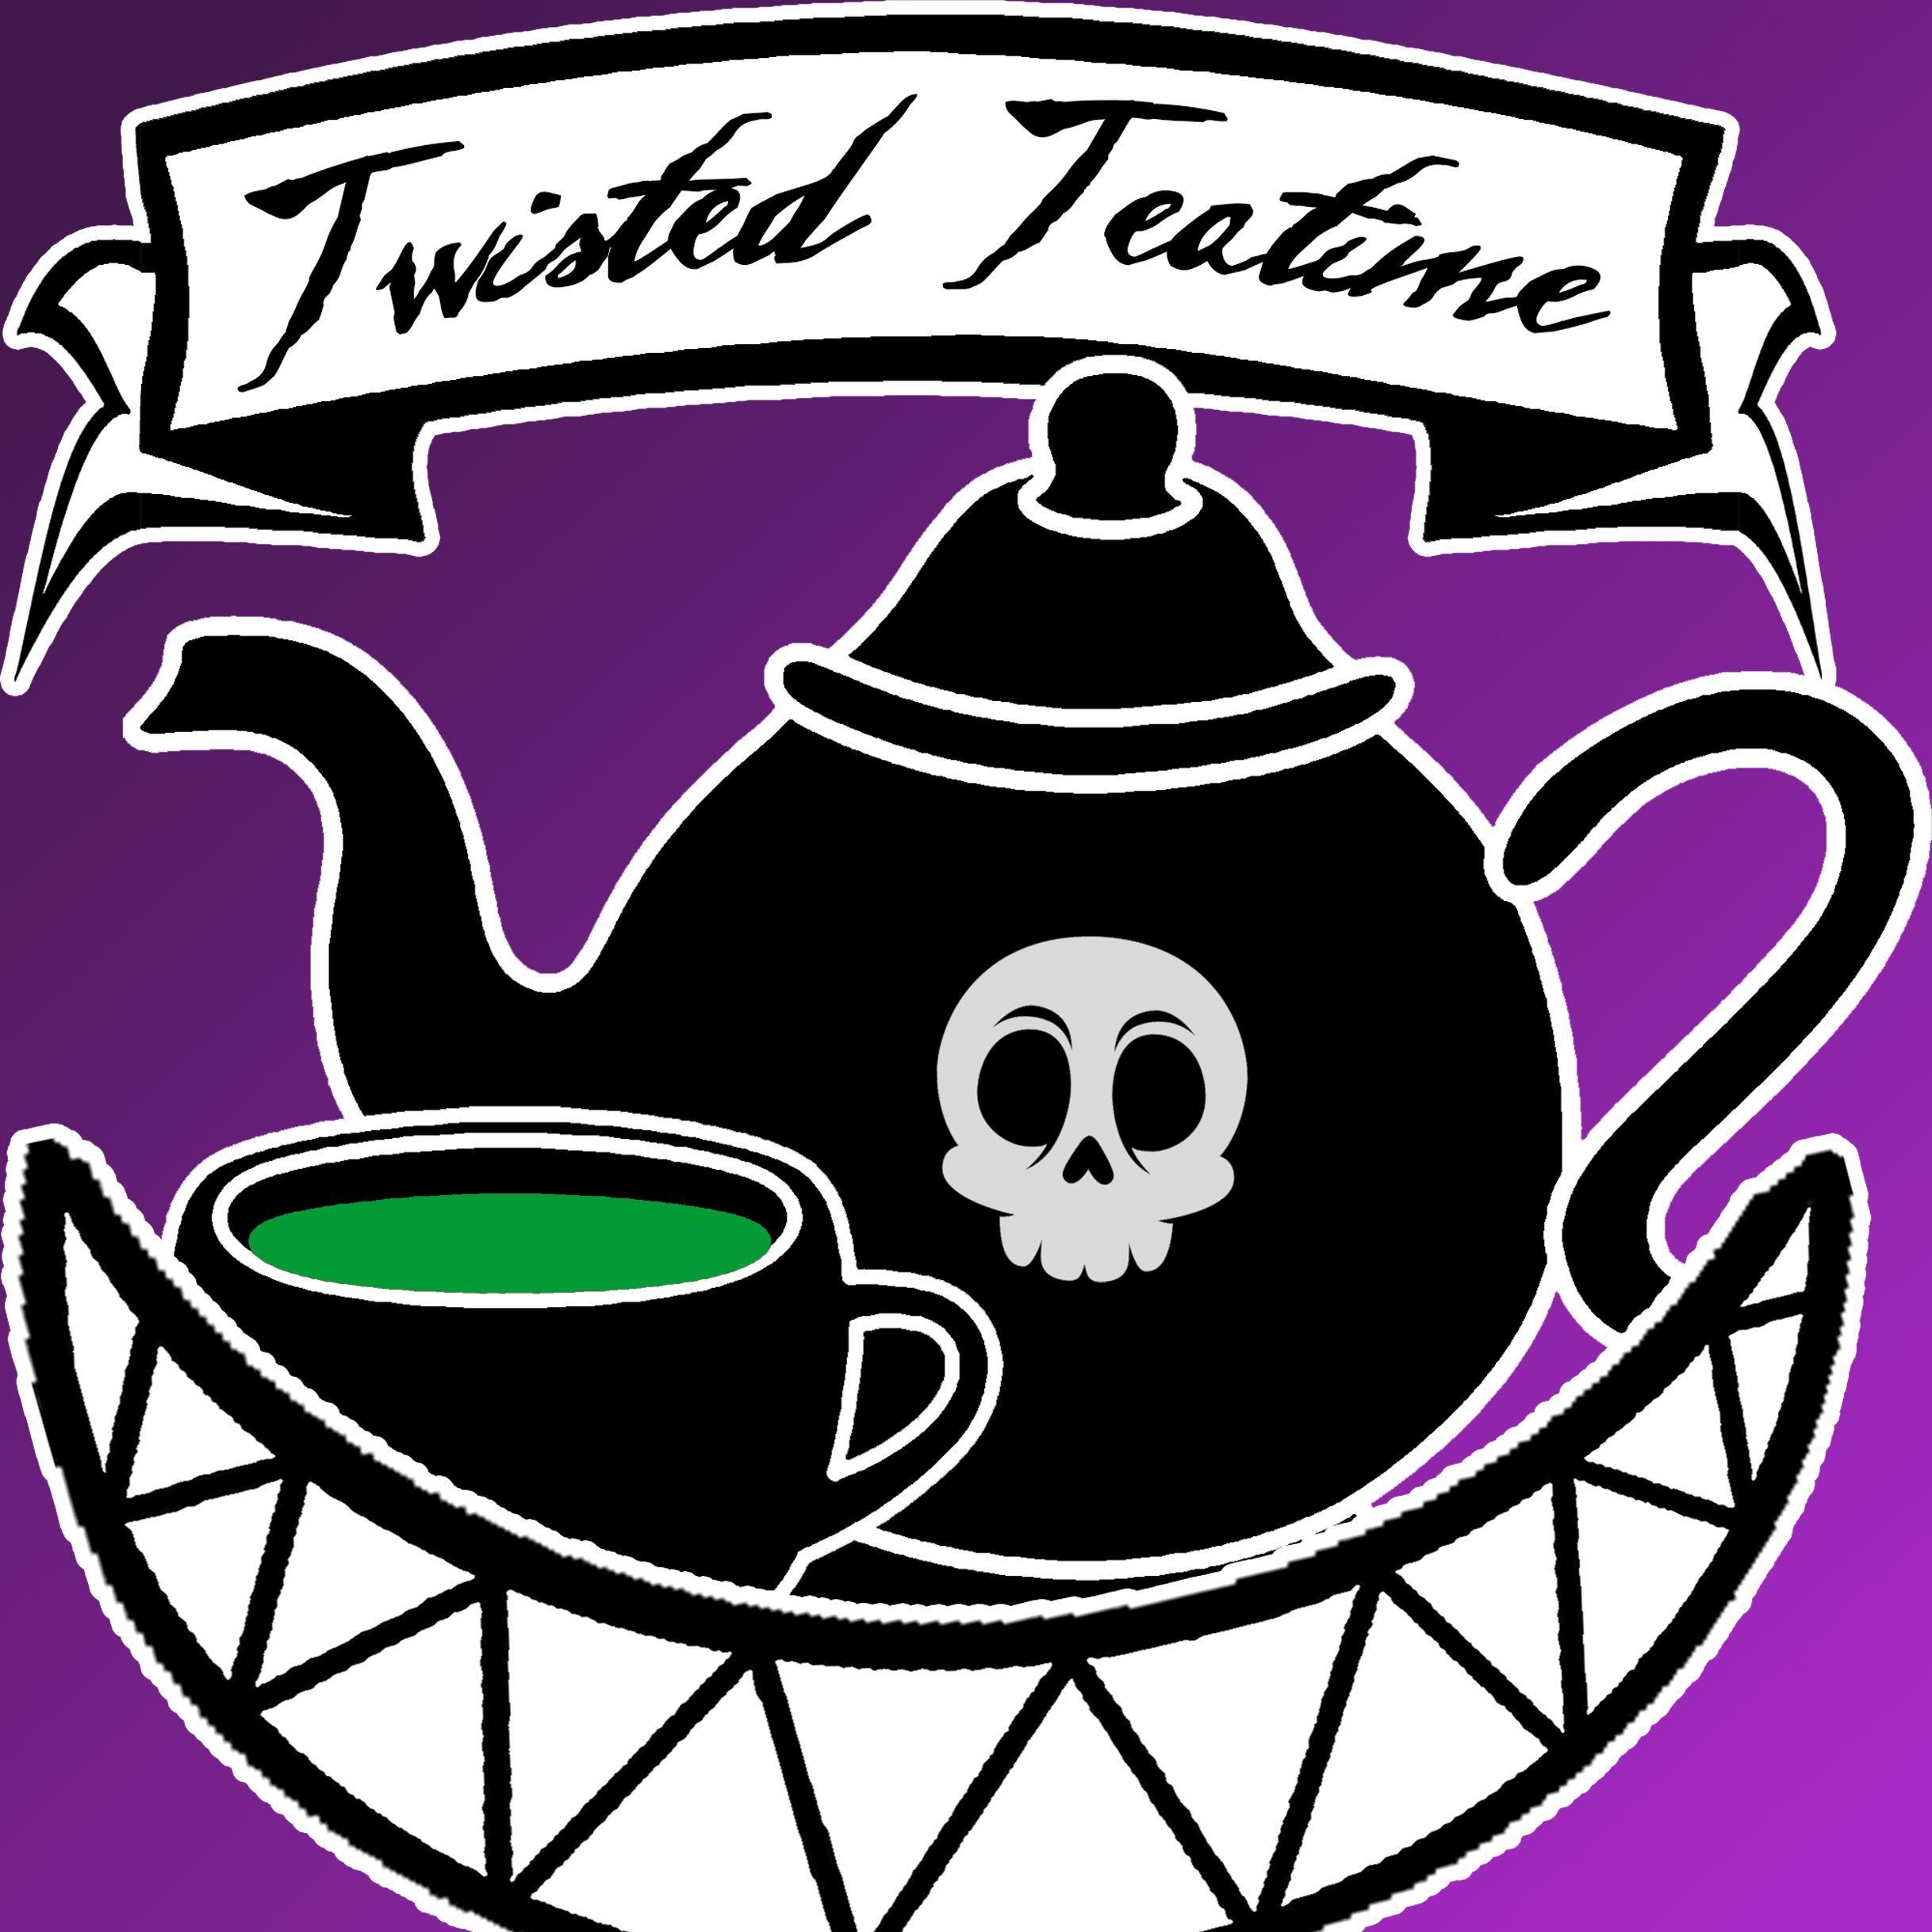 Twisted Teatime Halloween 2019 Day 18